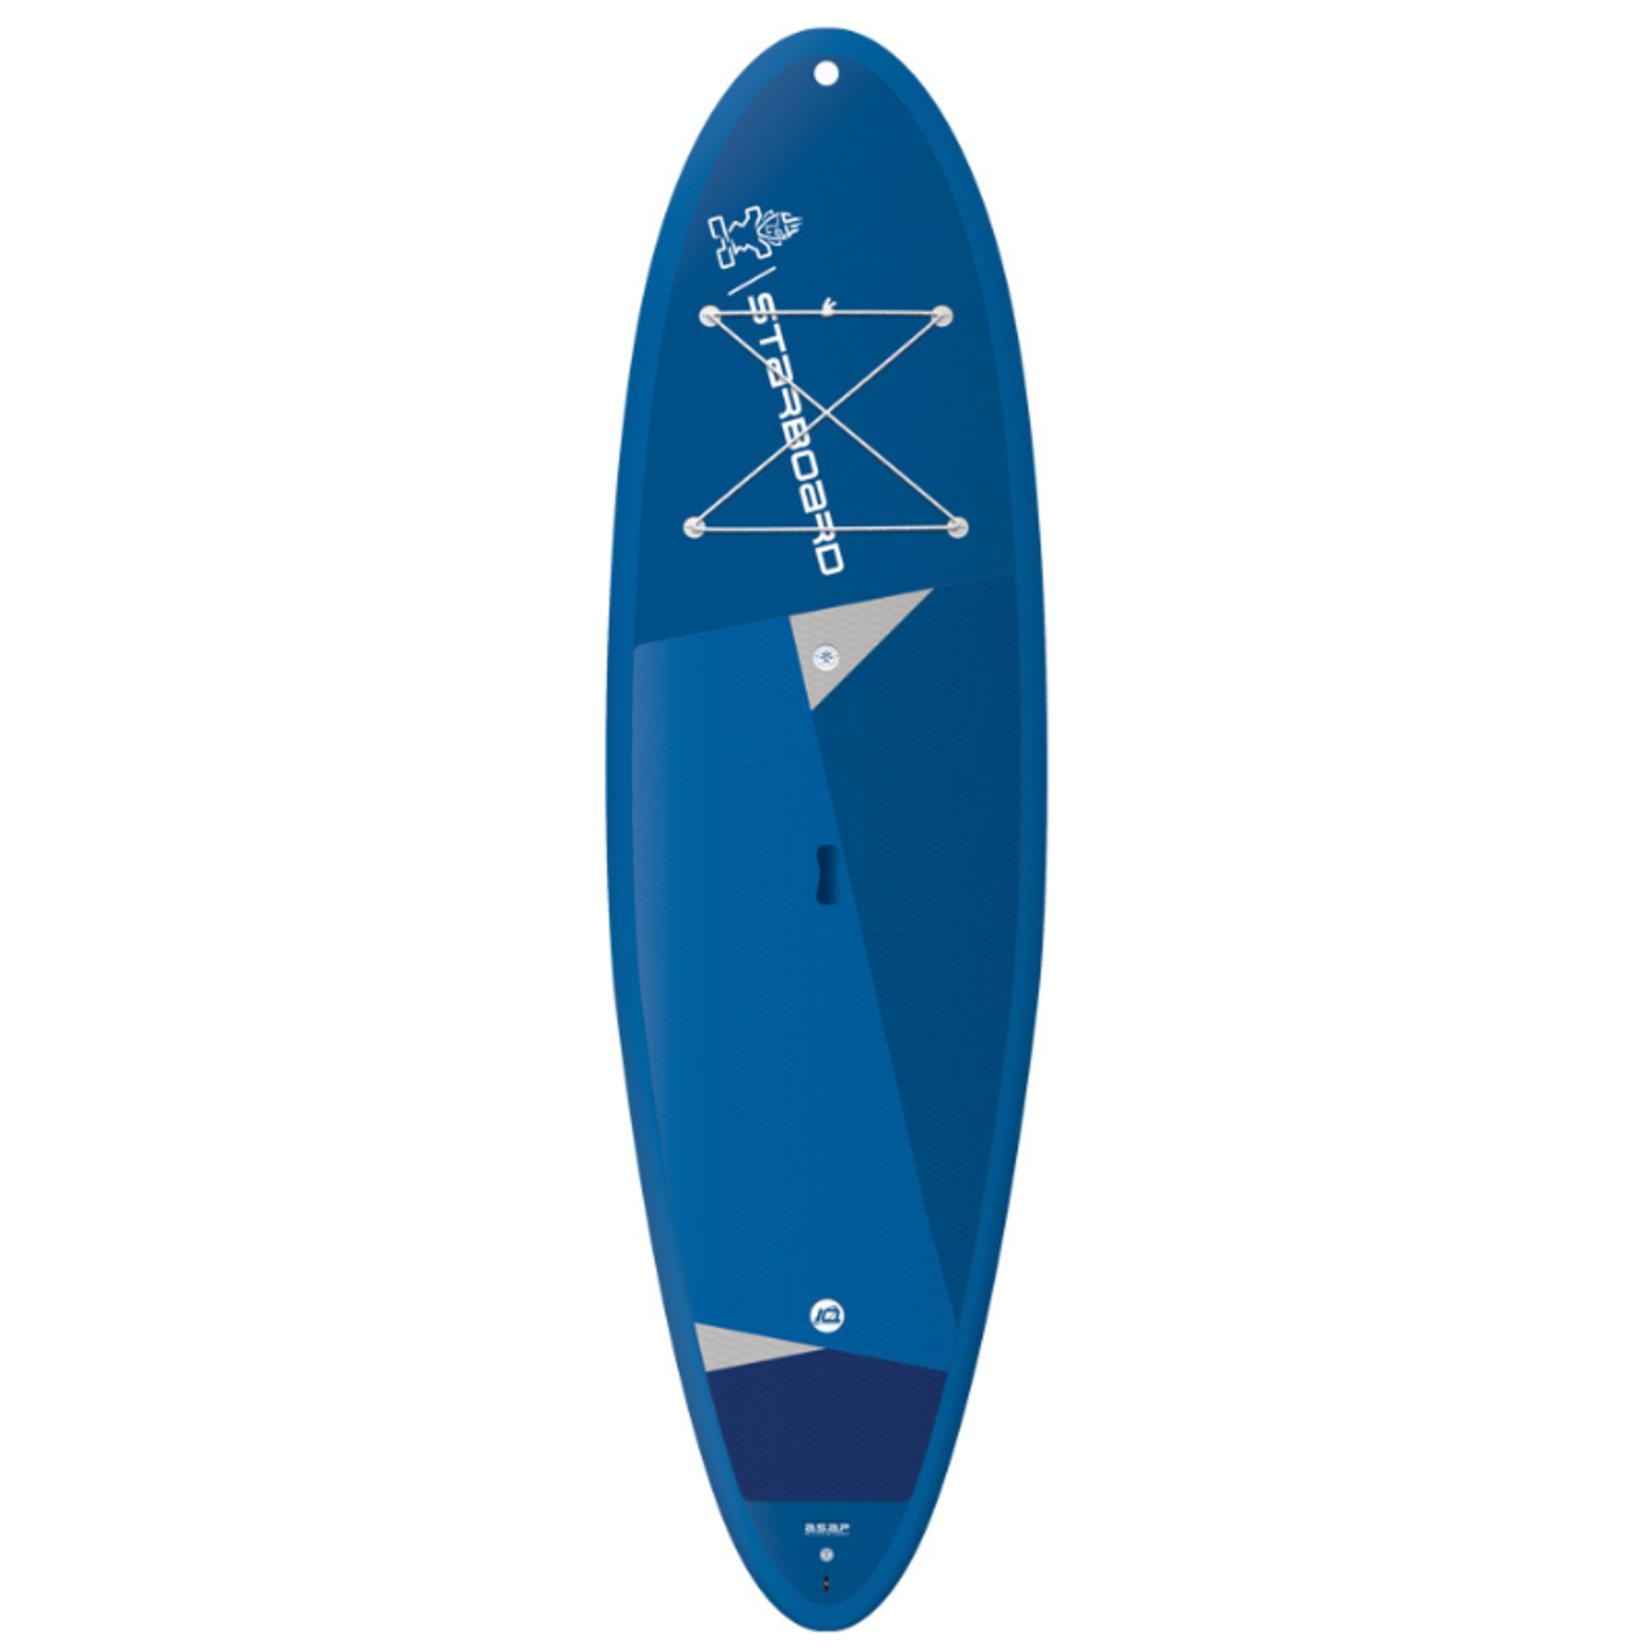 Starboard Prebook Starboard Whopper ASAP 10'0 x 34